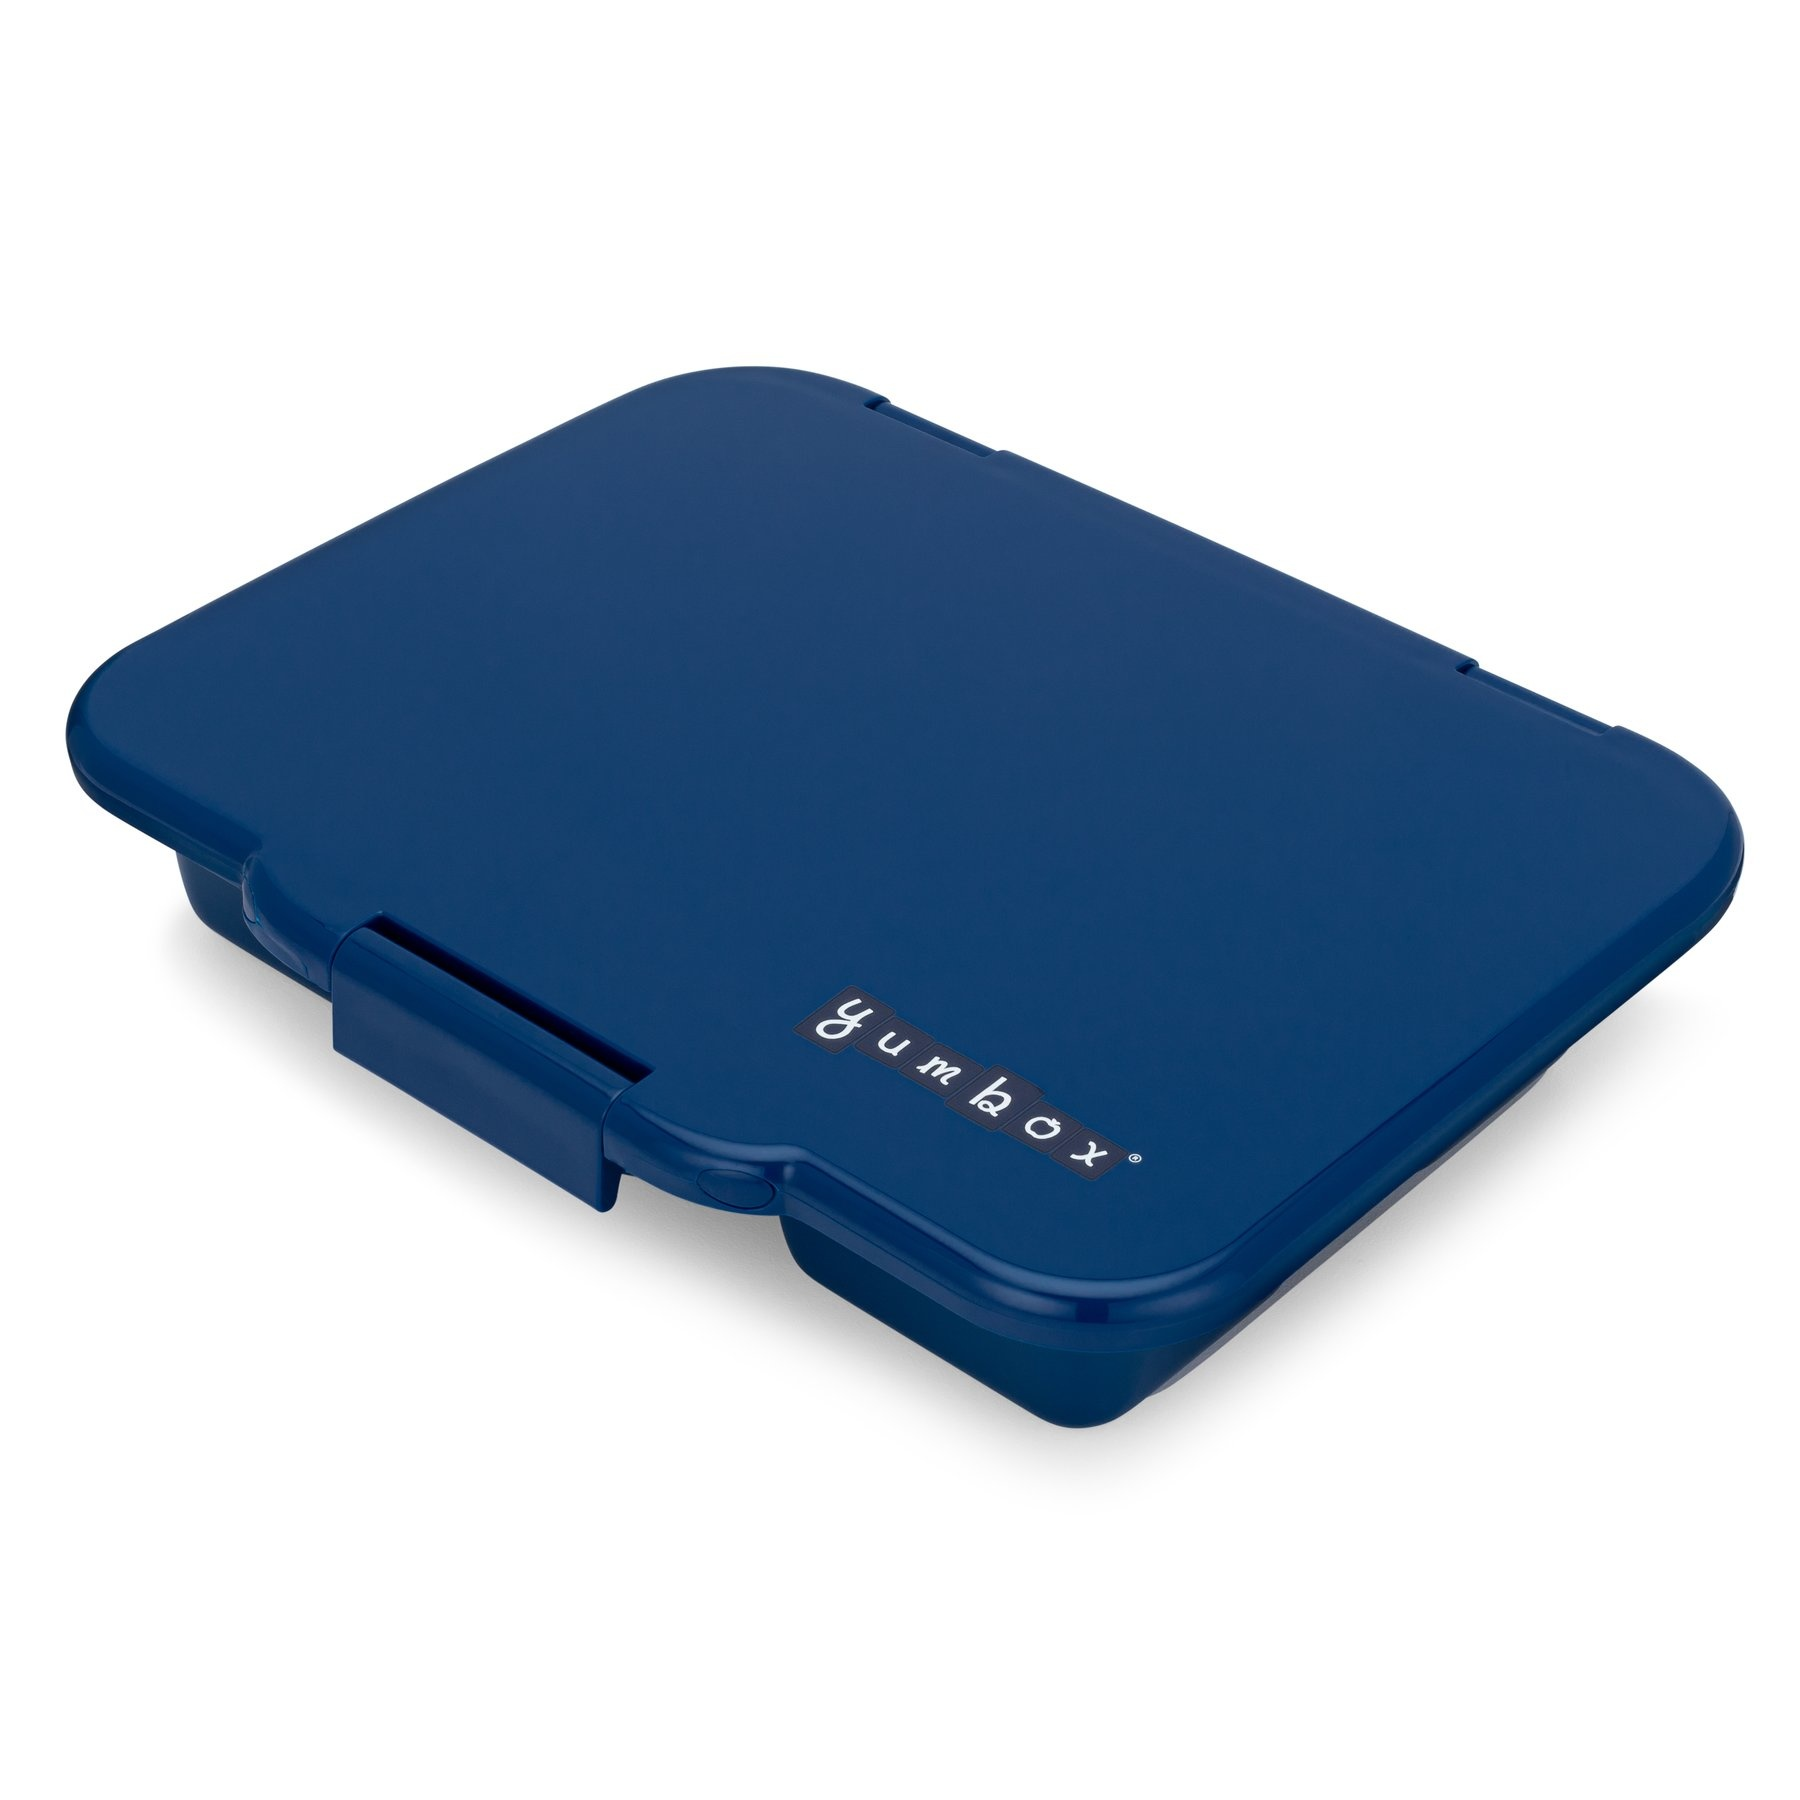 Stainless steel Bento Box with ceramic tray - Santa Fe blue-5